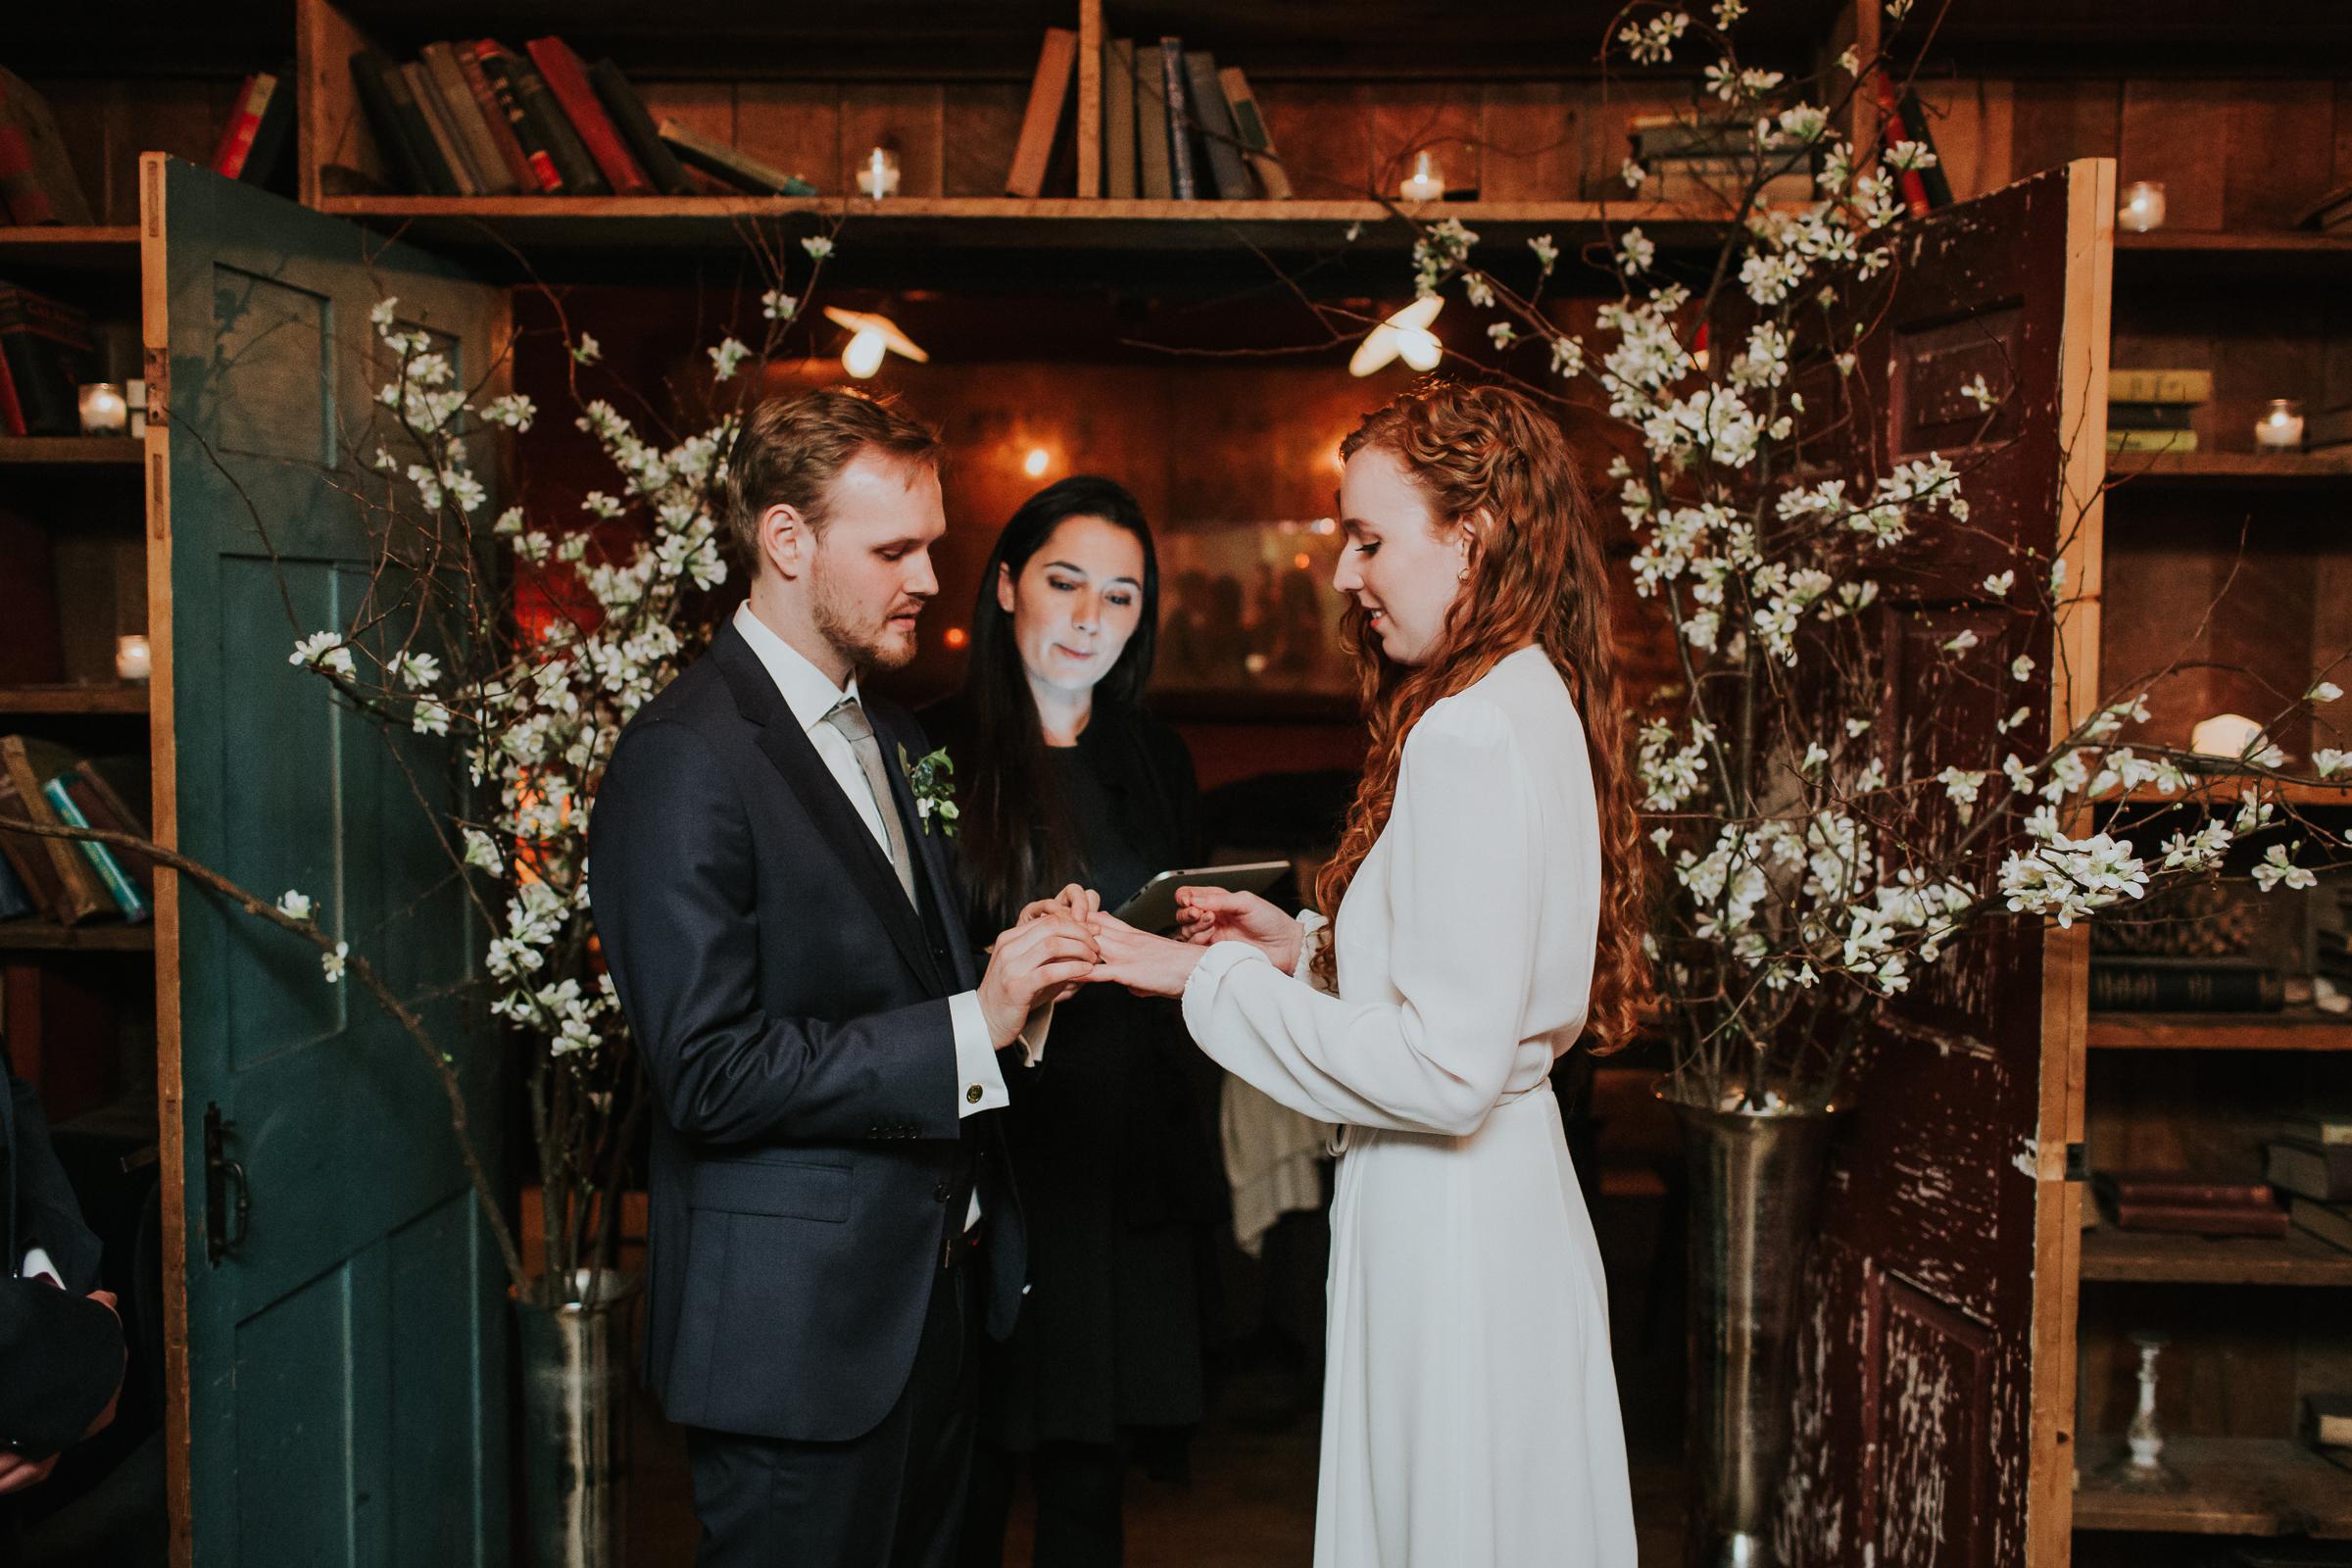 Freemans-Restaurant-Soho-Brooklyn-Bridge-Park-Dumbo-Documentary-Wedding-Photographer-48.jpg